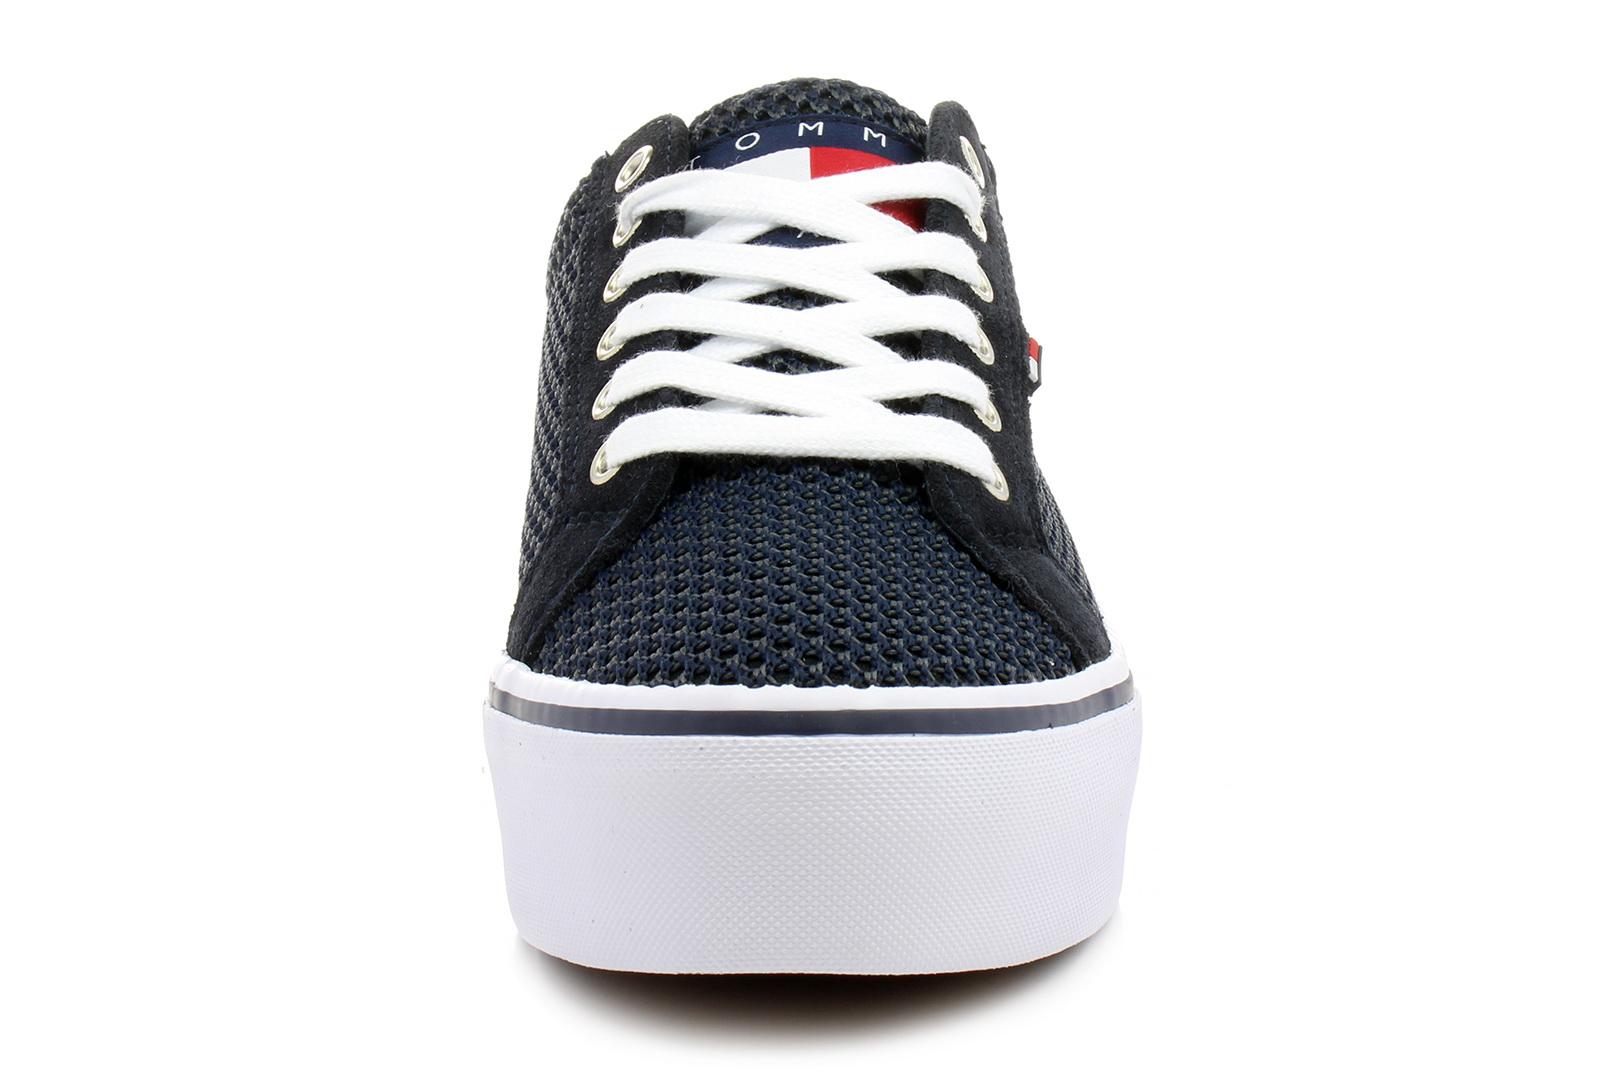 ef958de62f Tommy Hilfiger Cipő - Livvy 1c1 - 19S-0409-403 - Office Shoes ...